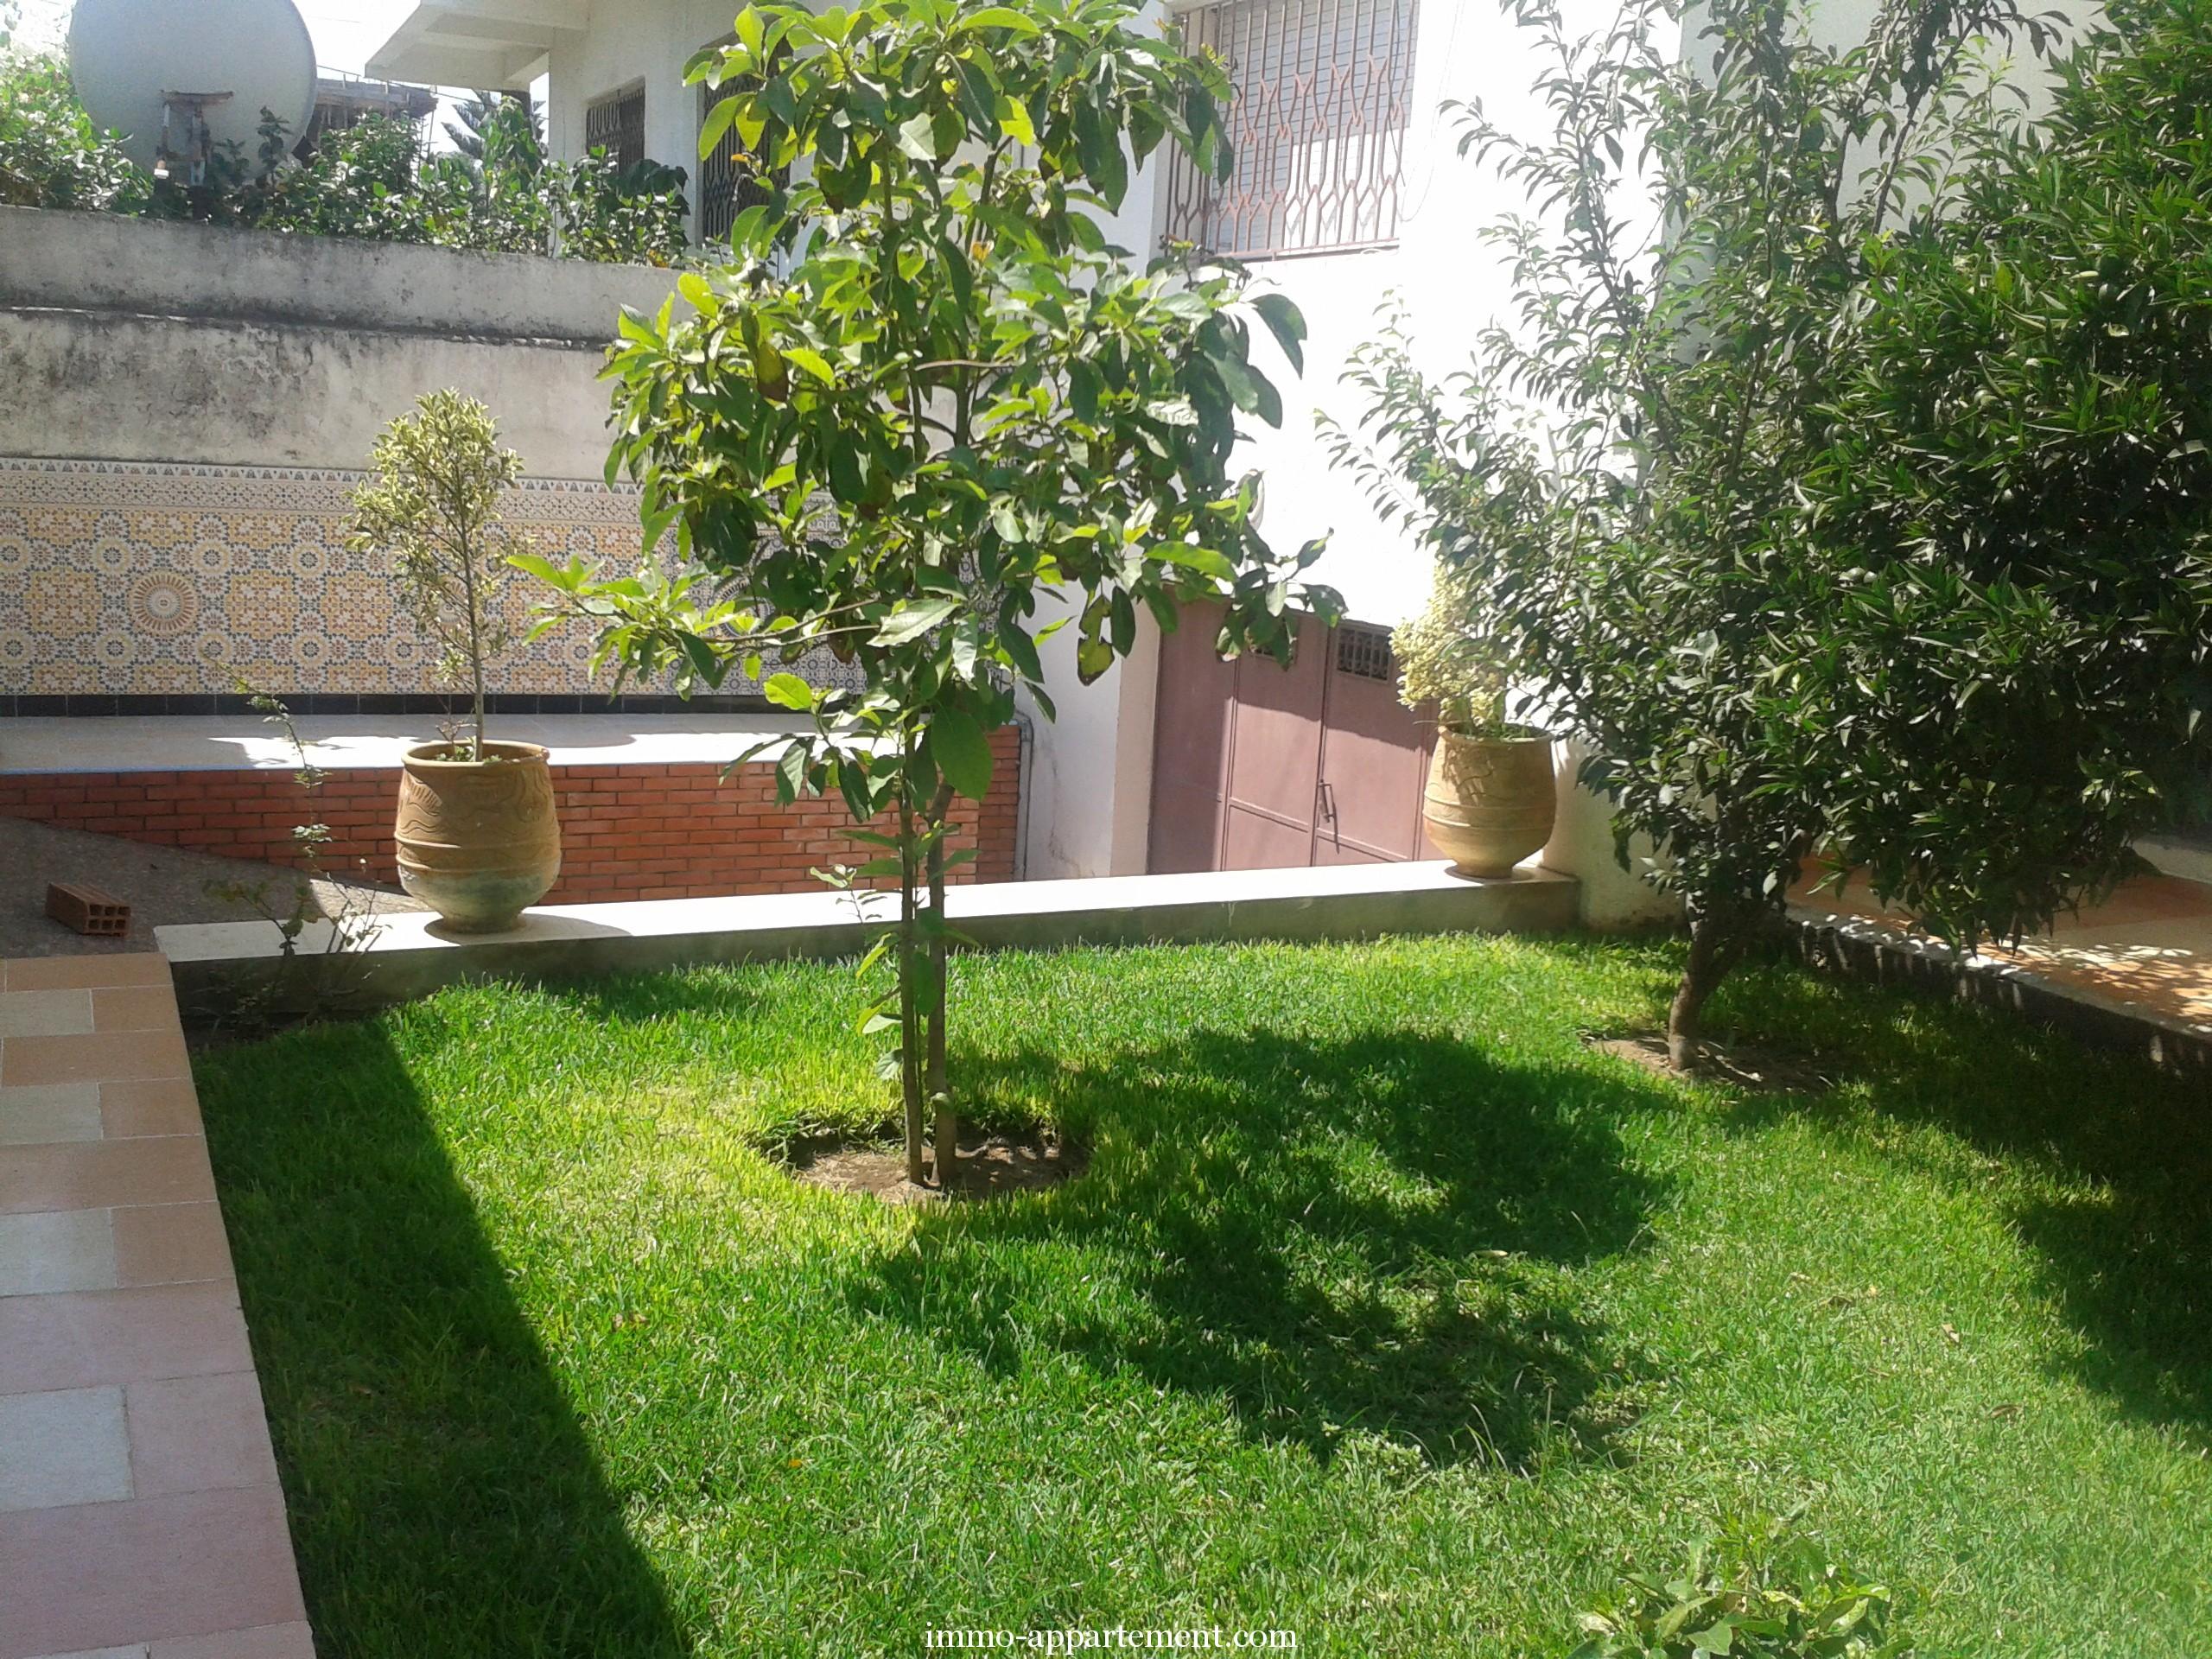 Villa louer avec jardin kenitrai immo appartement for Jardin villa antonine beziers